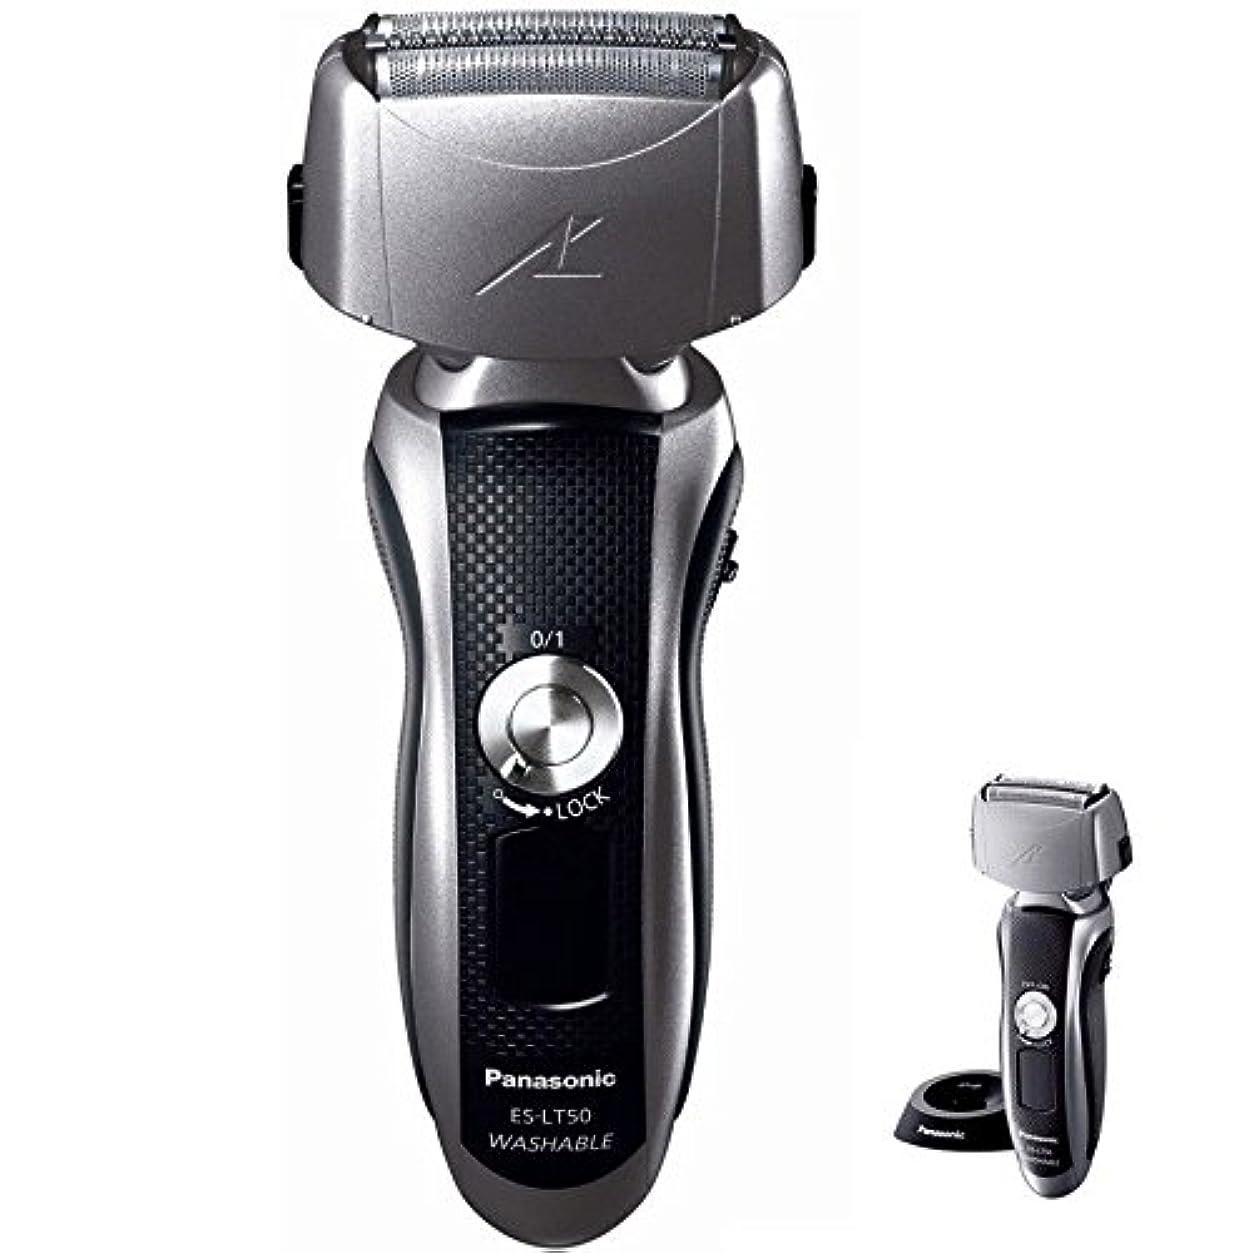 Panasonic ES-LT50 ラムダッシュメンズシェーバー3ブレード ESLT50 [並行輸入品]